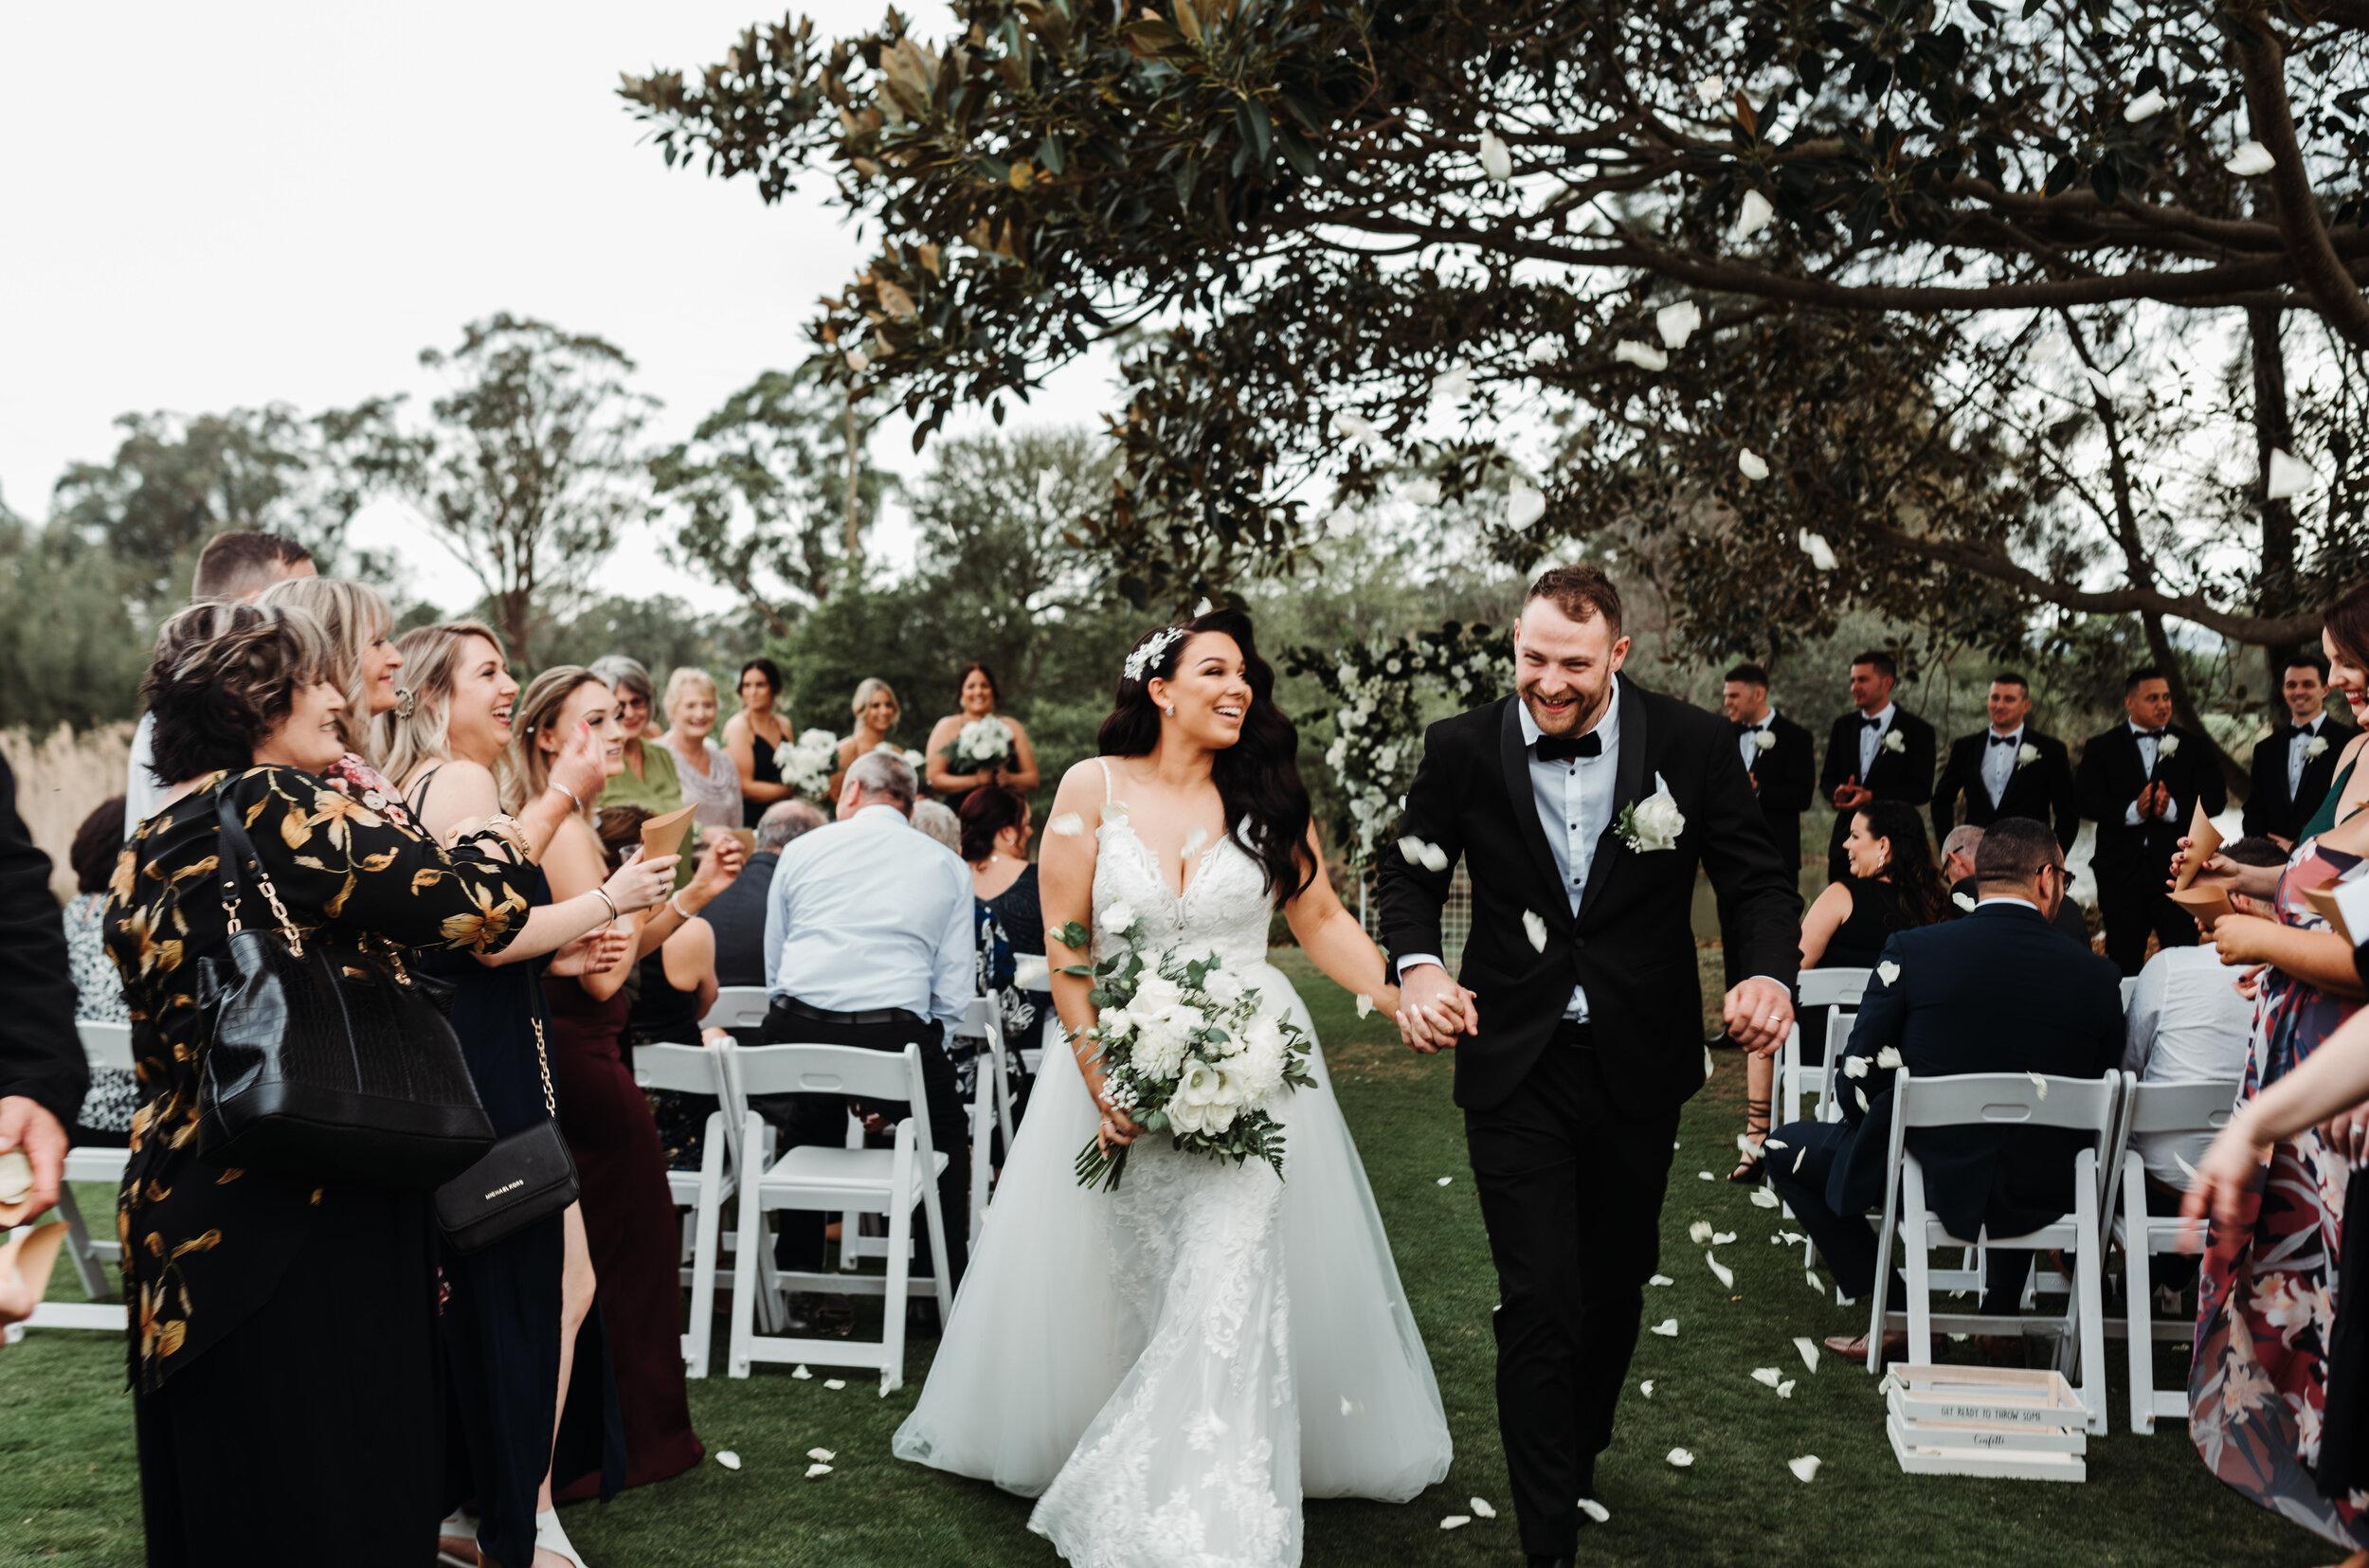 Samantha & Troy - The Grange, Kembla Grange Wedding    6th September 2019